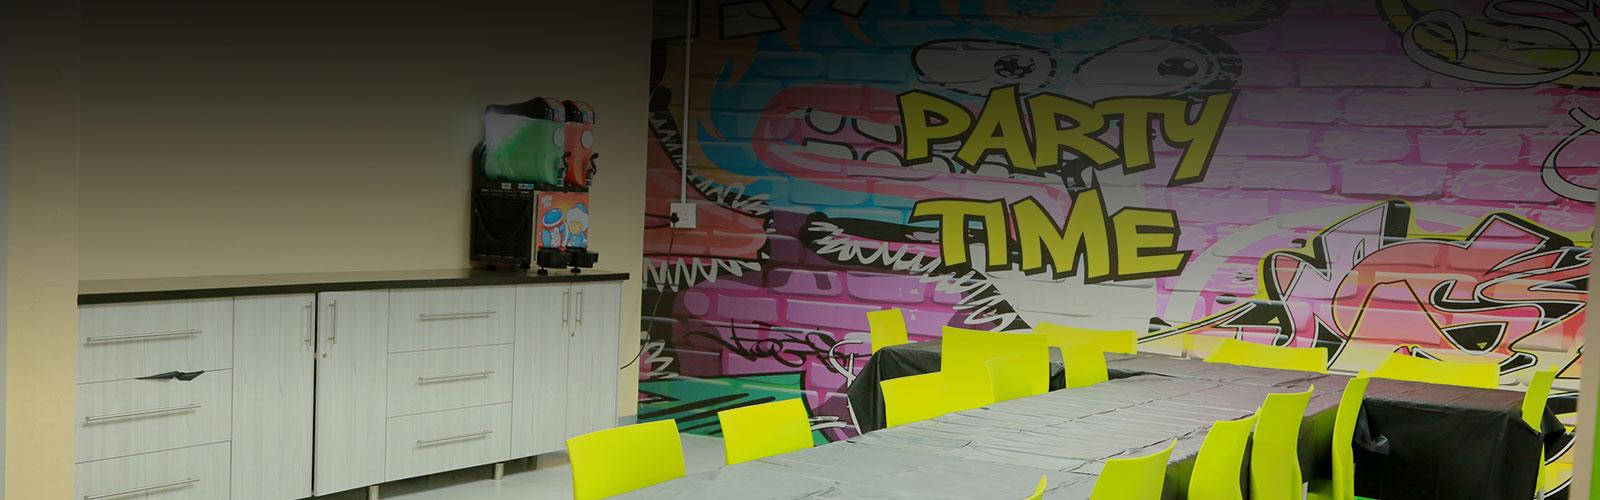 23 Jump Street | Trampoline Park